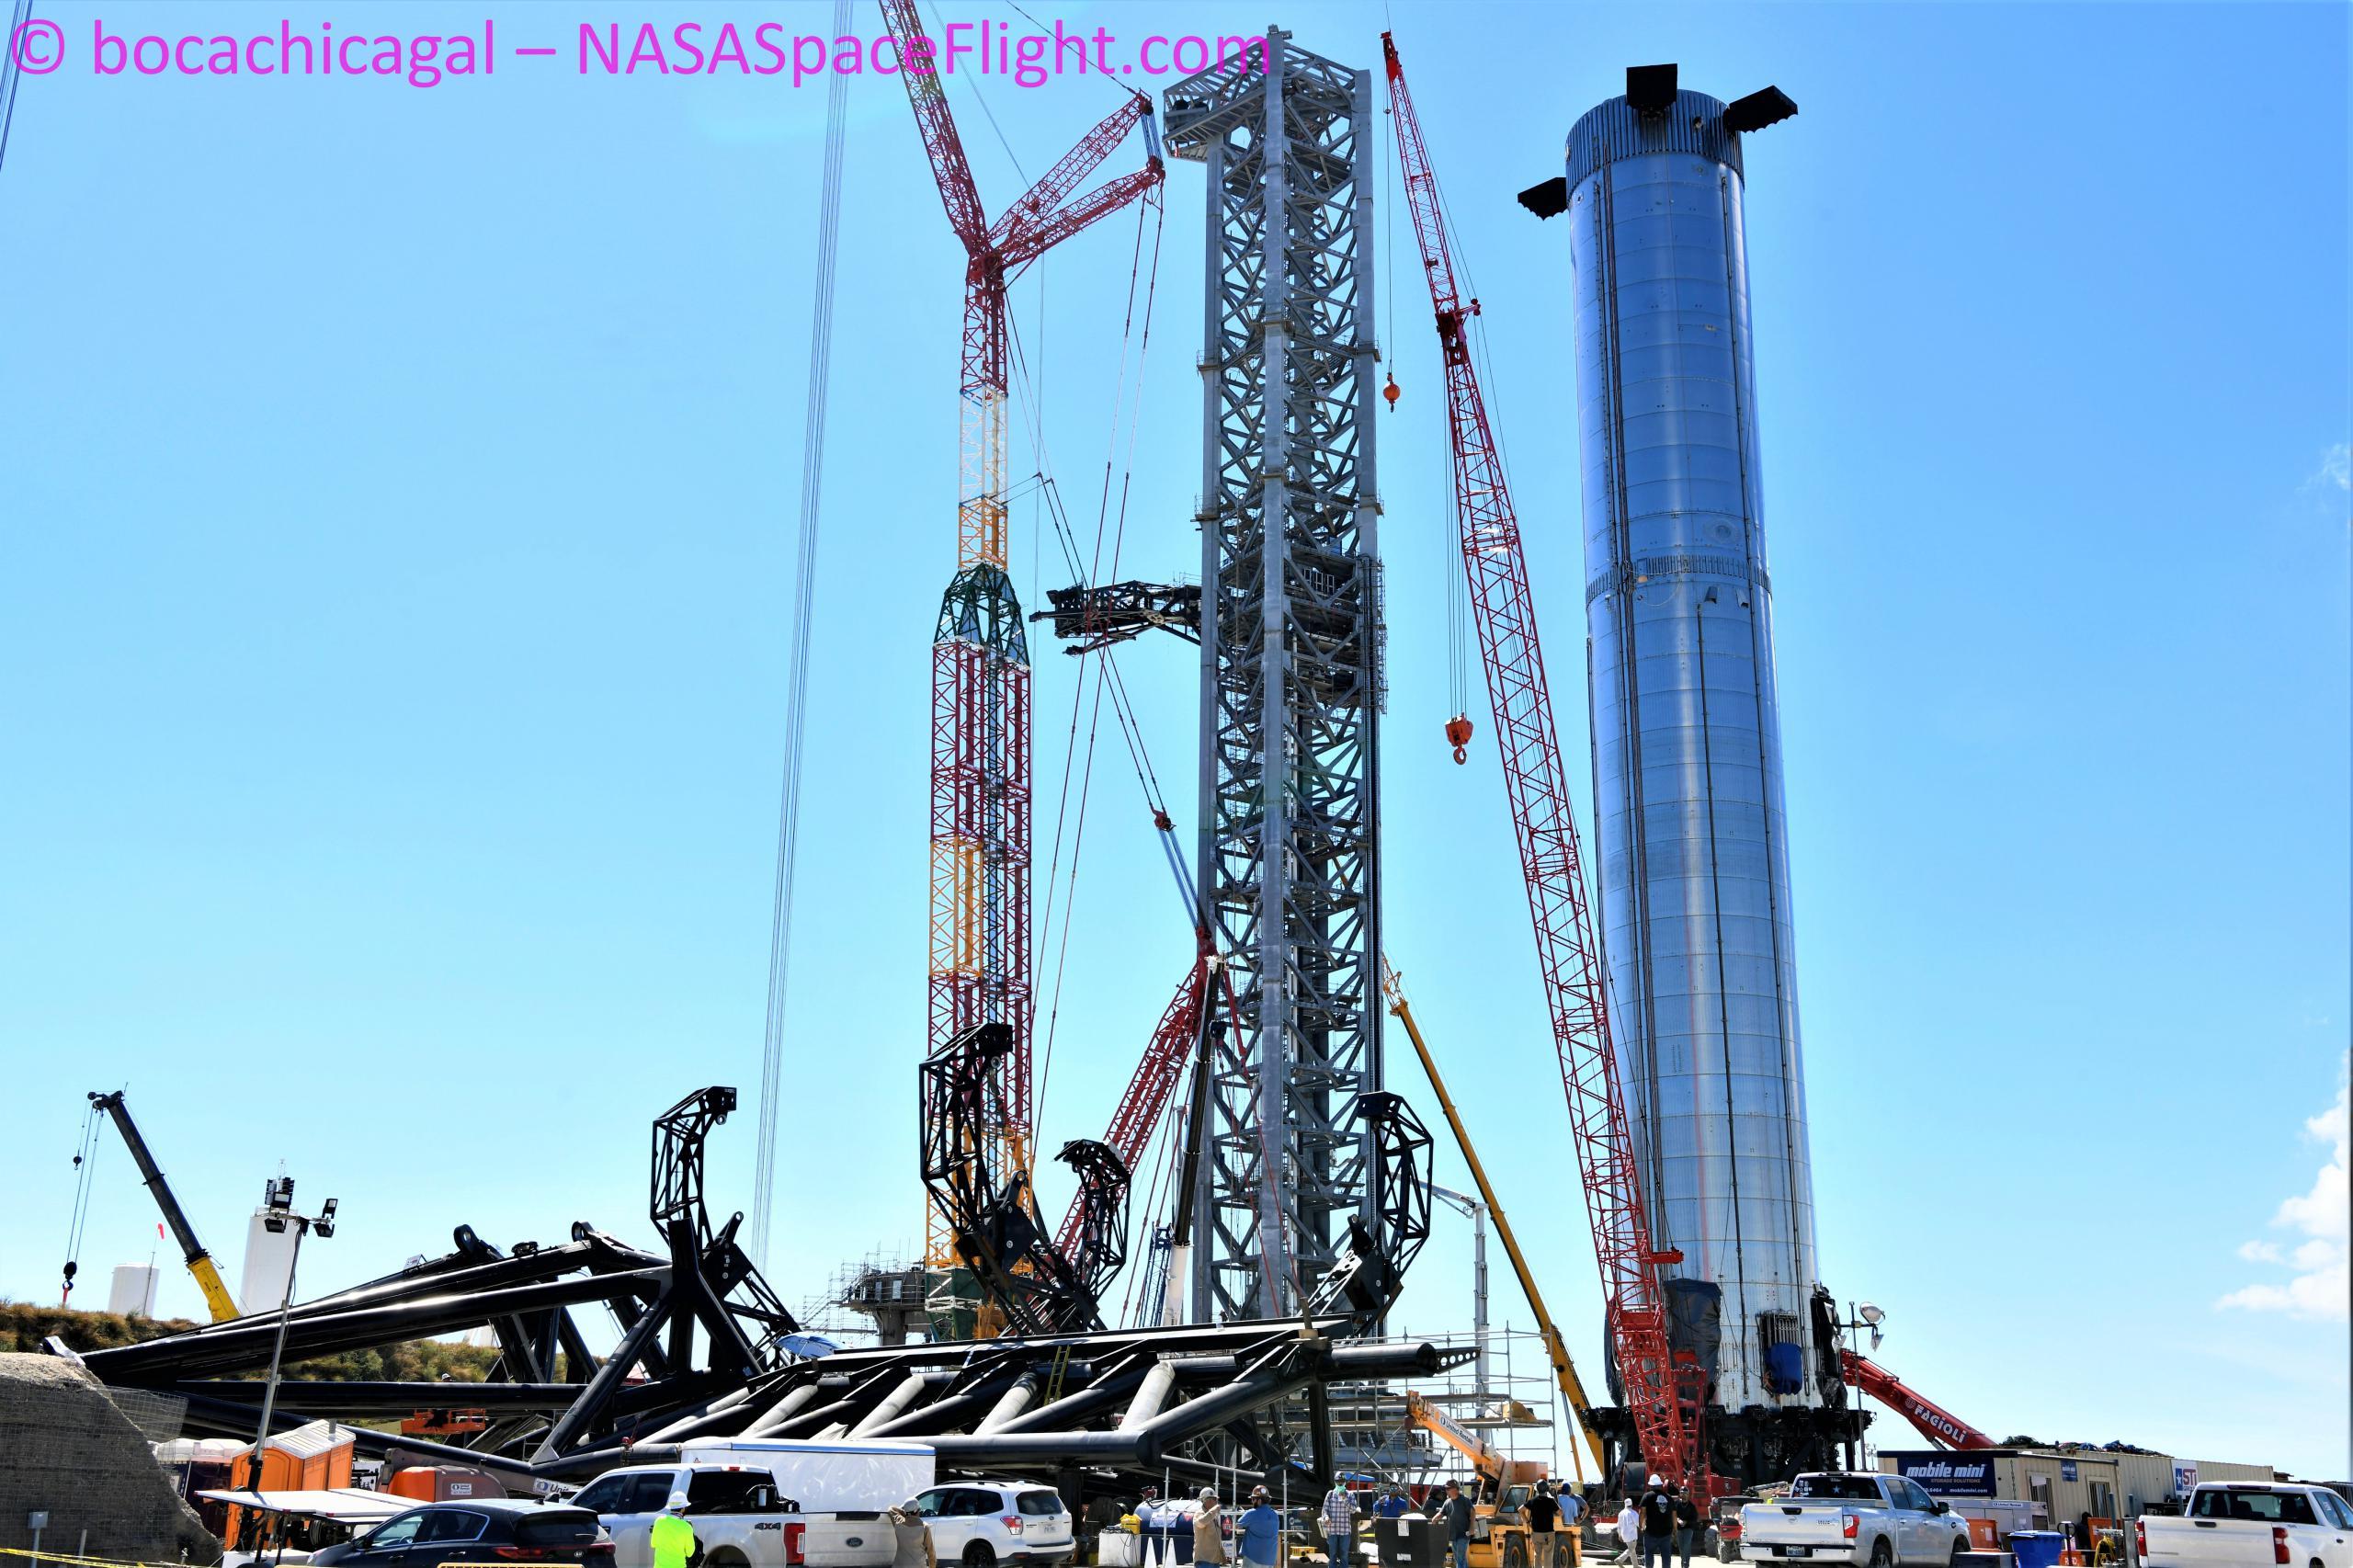 Starbase 092621 (NASASpaceflight – bocachicagal) B4 + orbital pad + catch arms 1 (c)